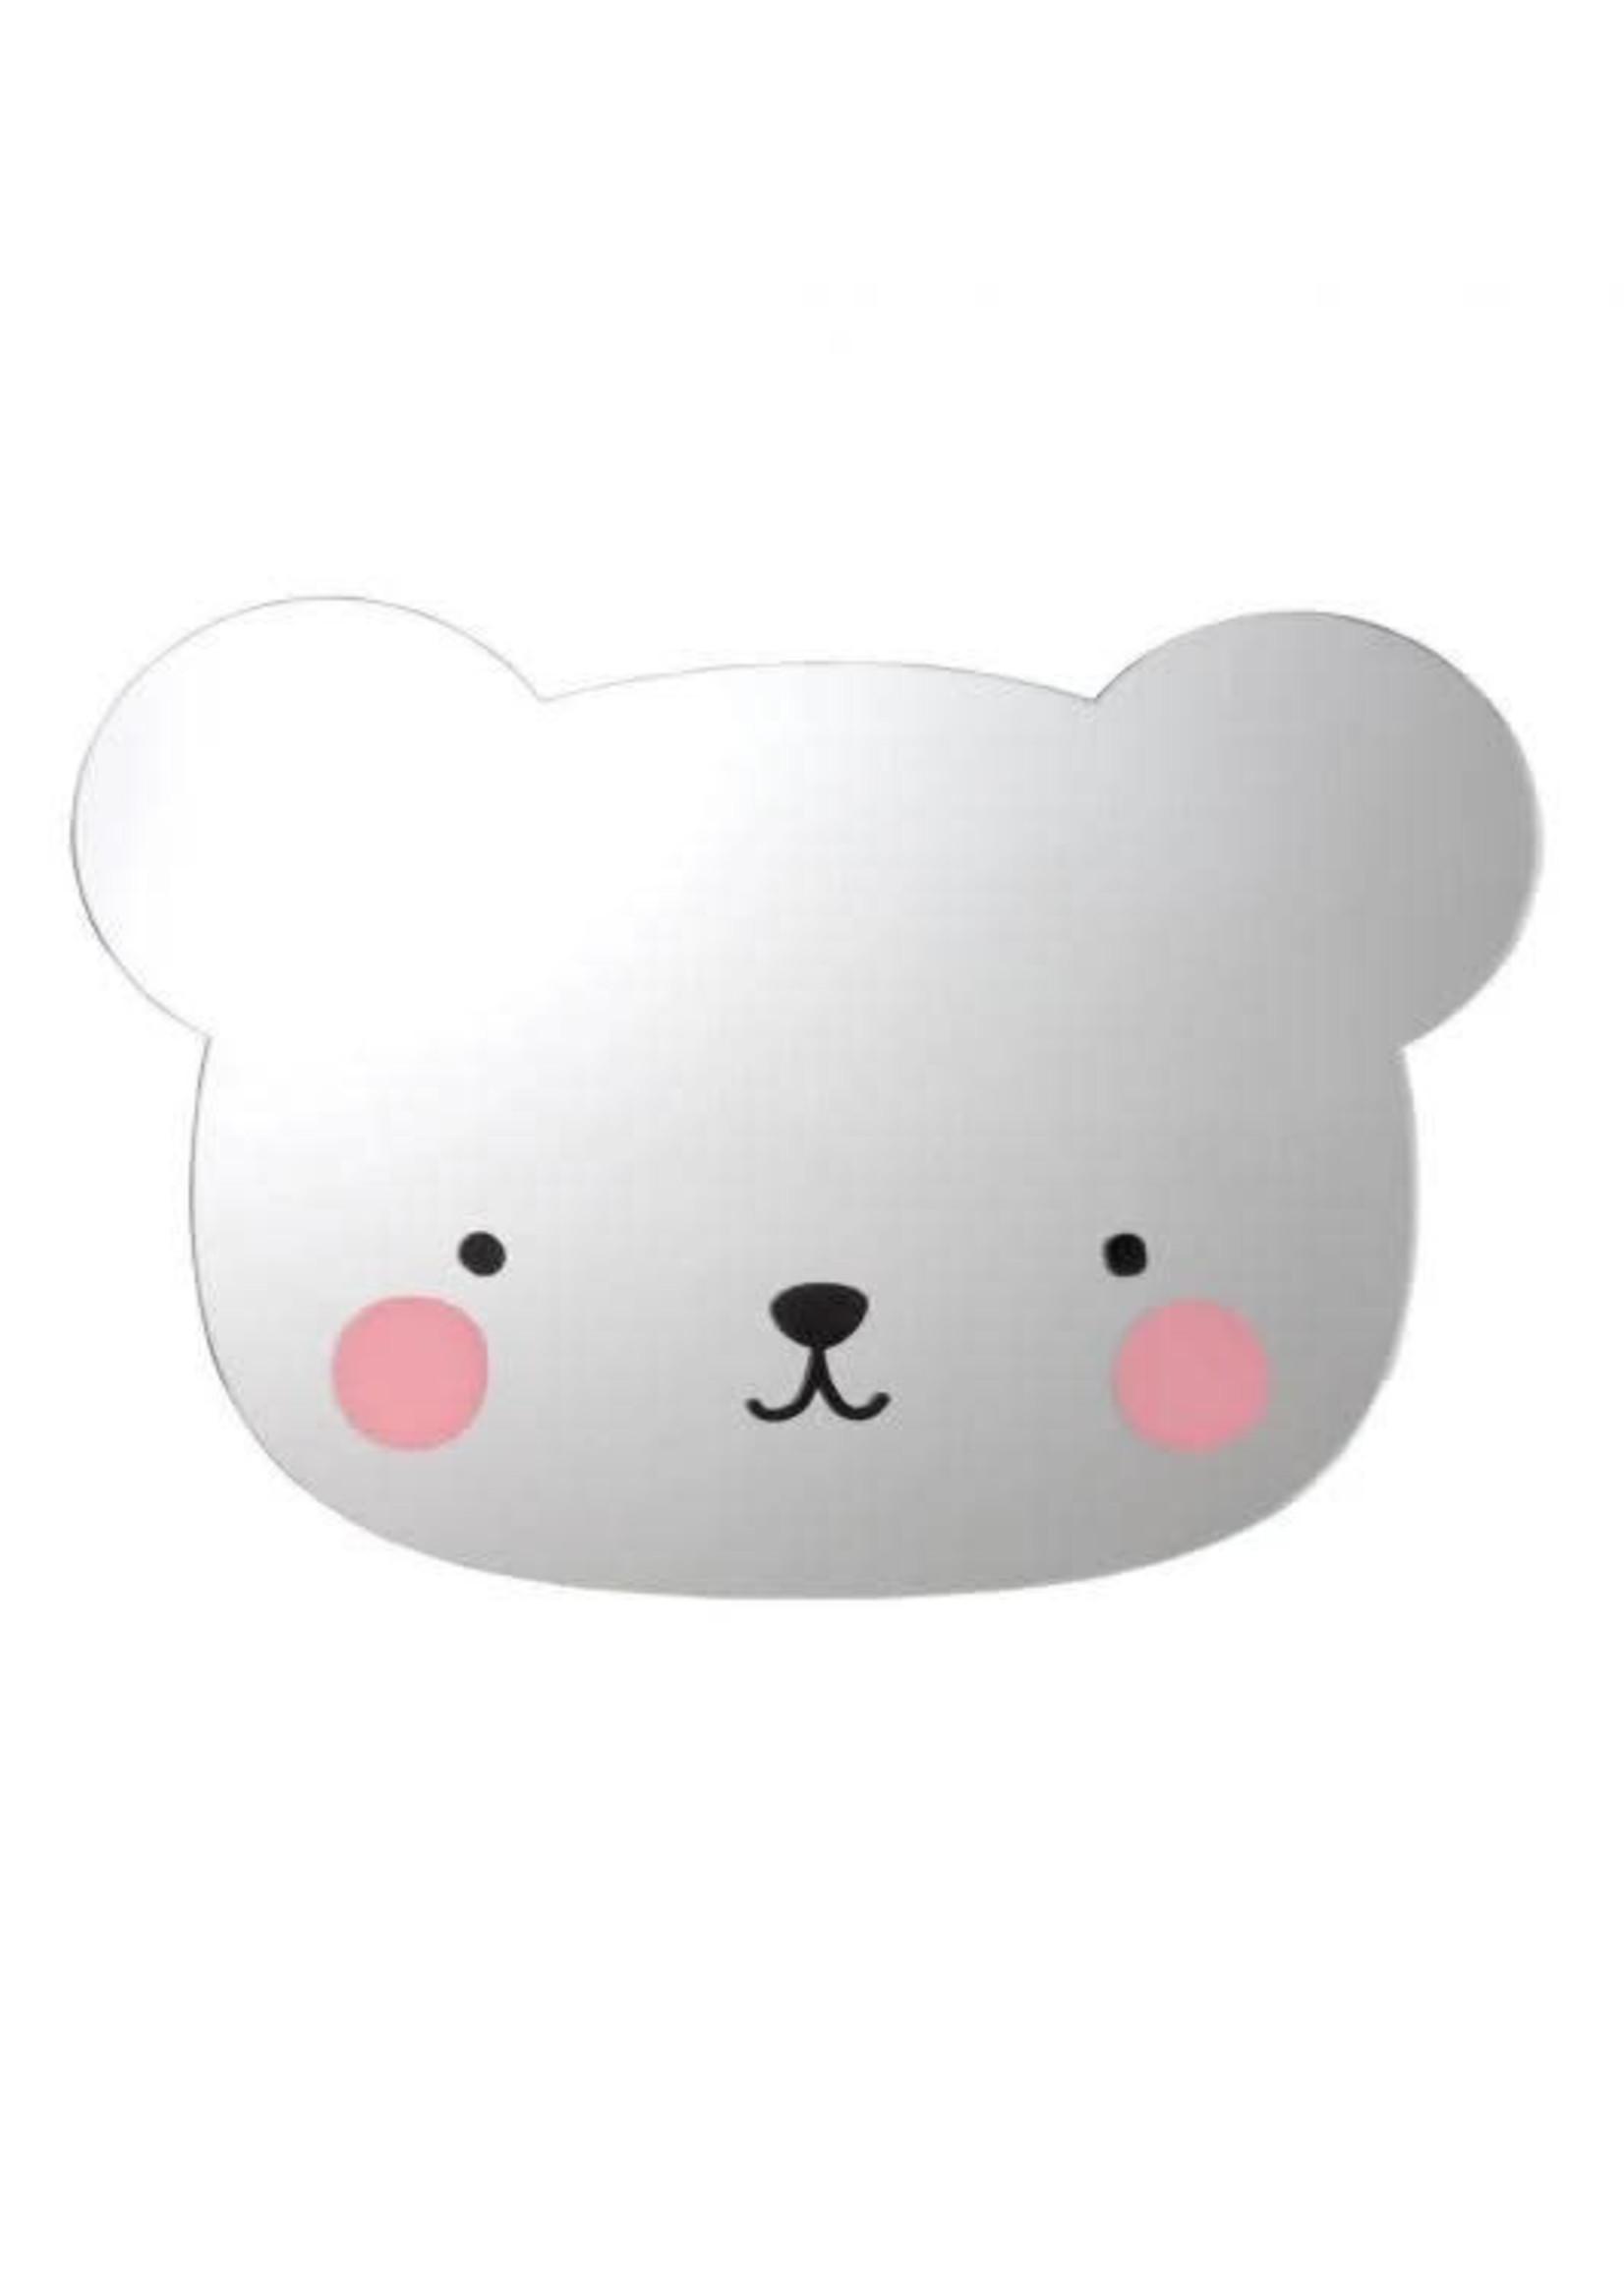 A Little Lovely Co. LLC Mirror (Panda)